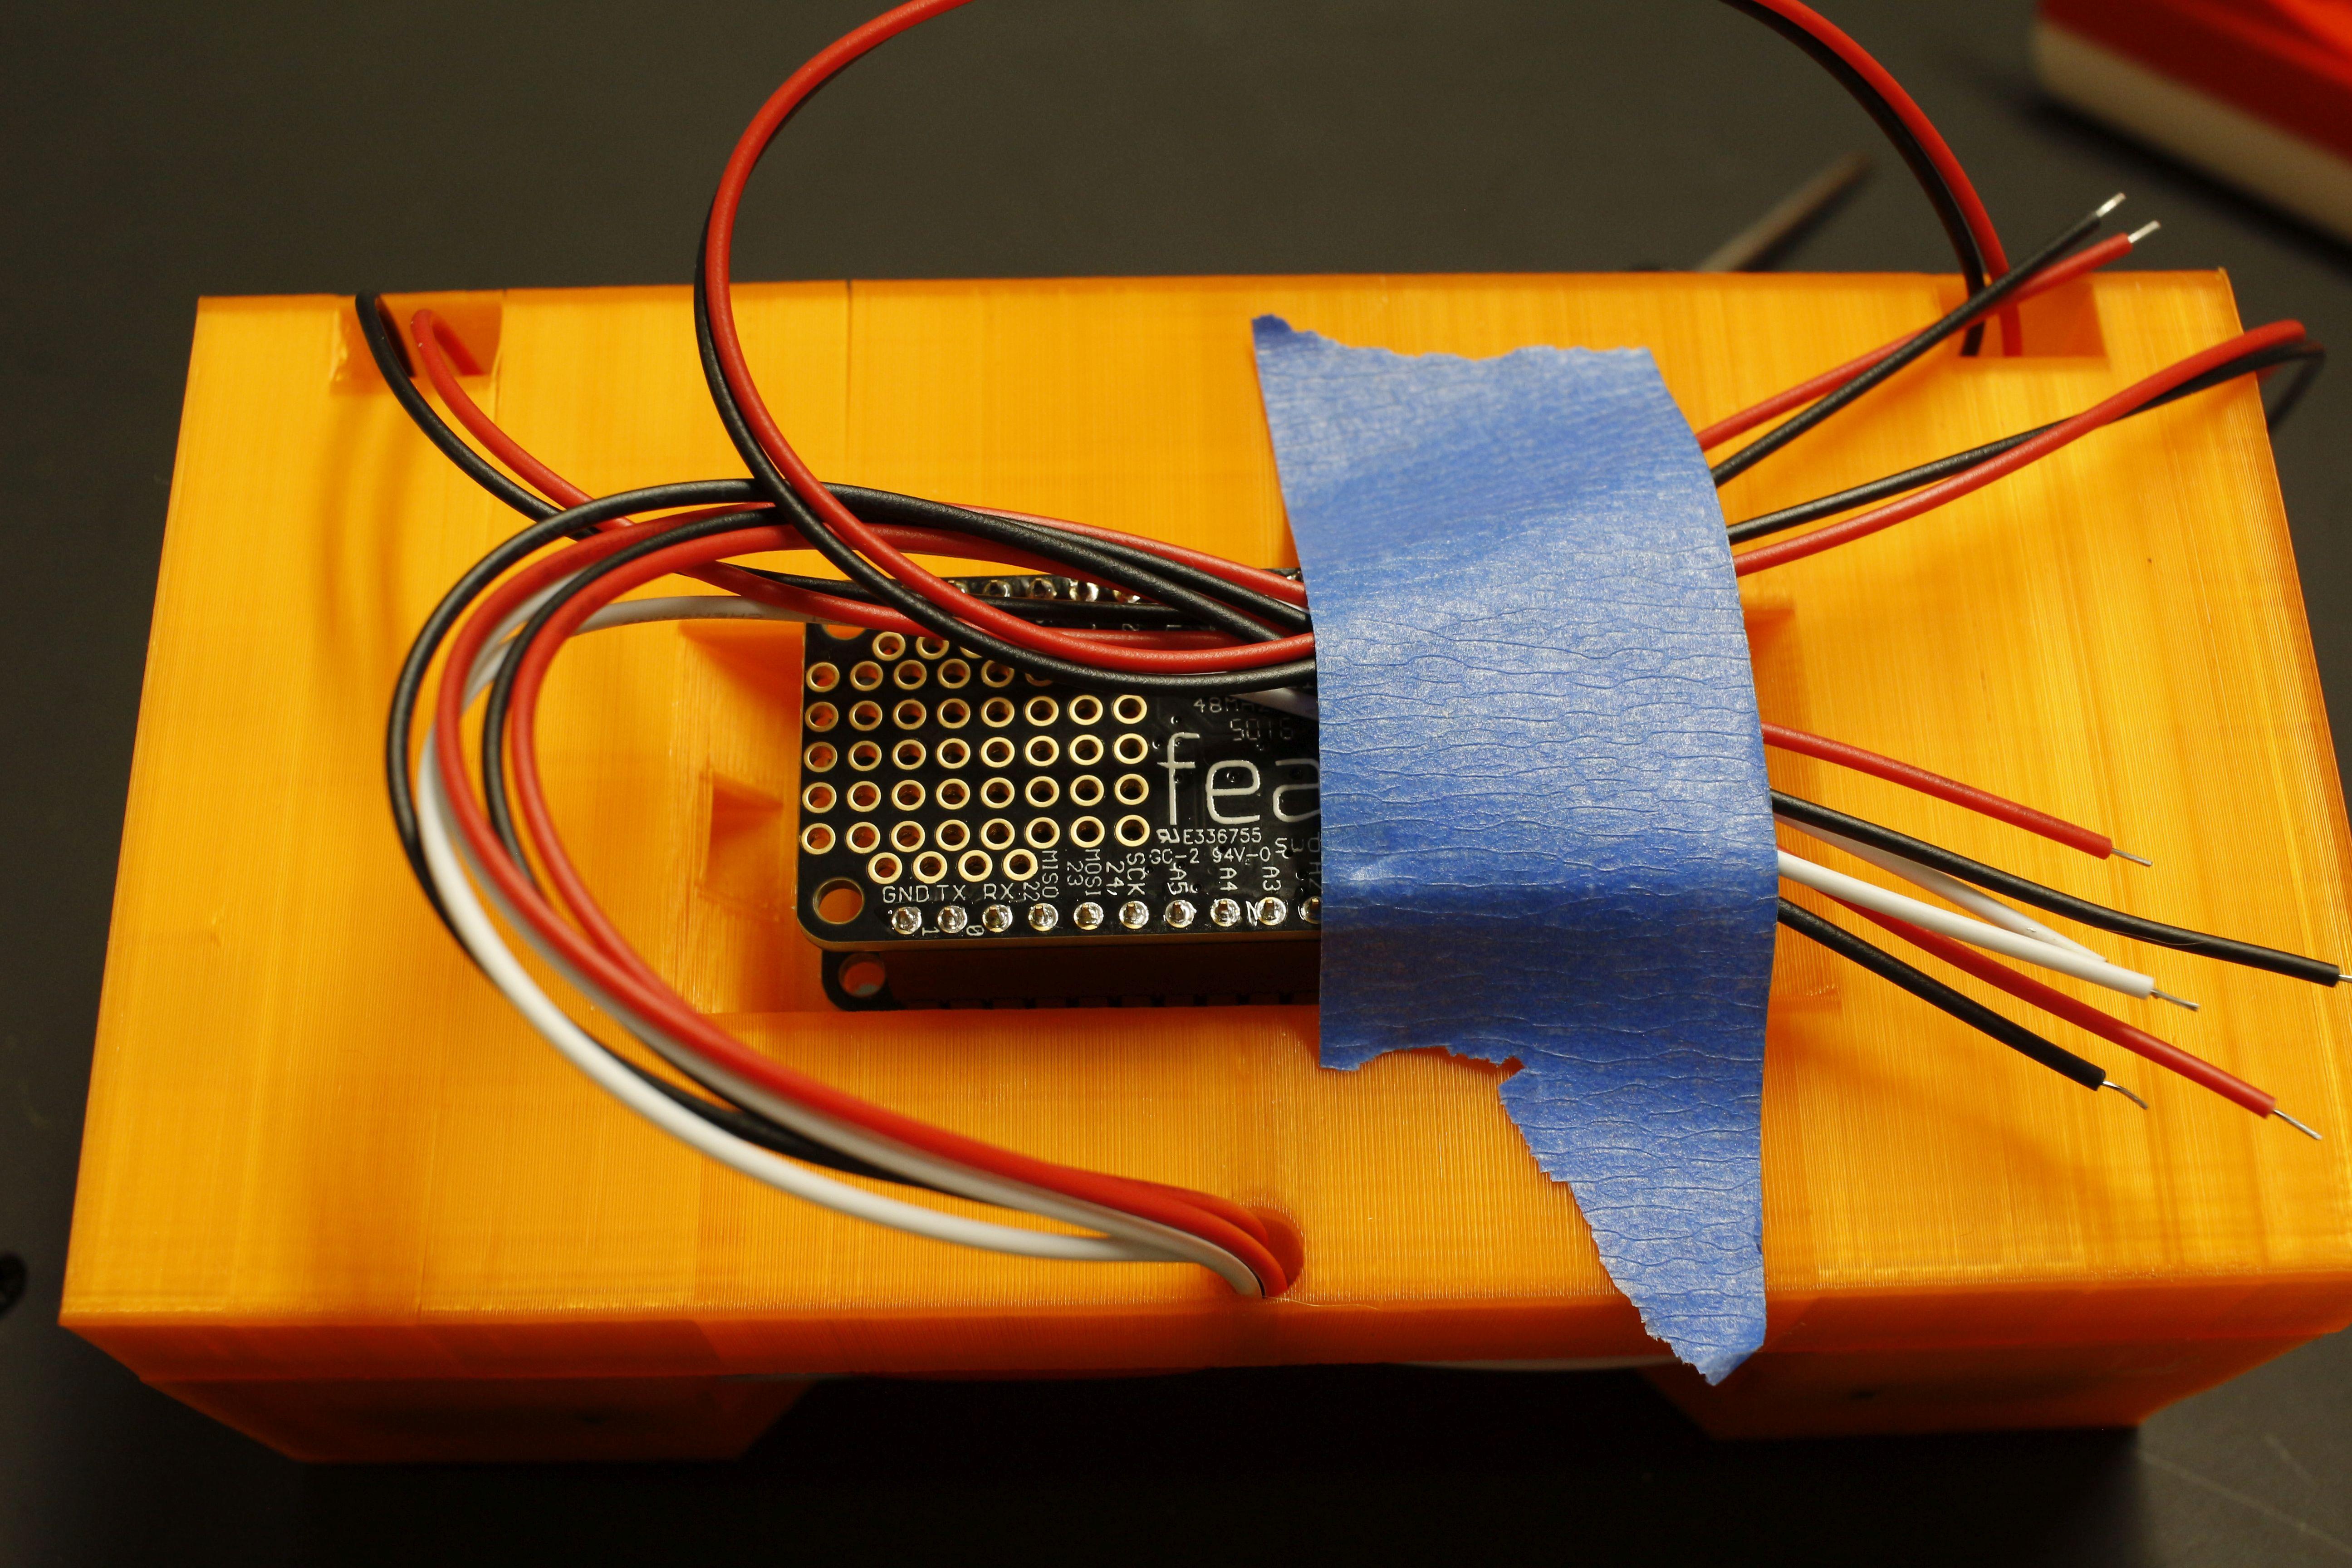 sensors__MG_9682.jpg